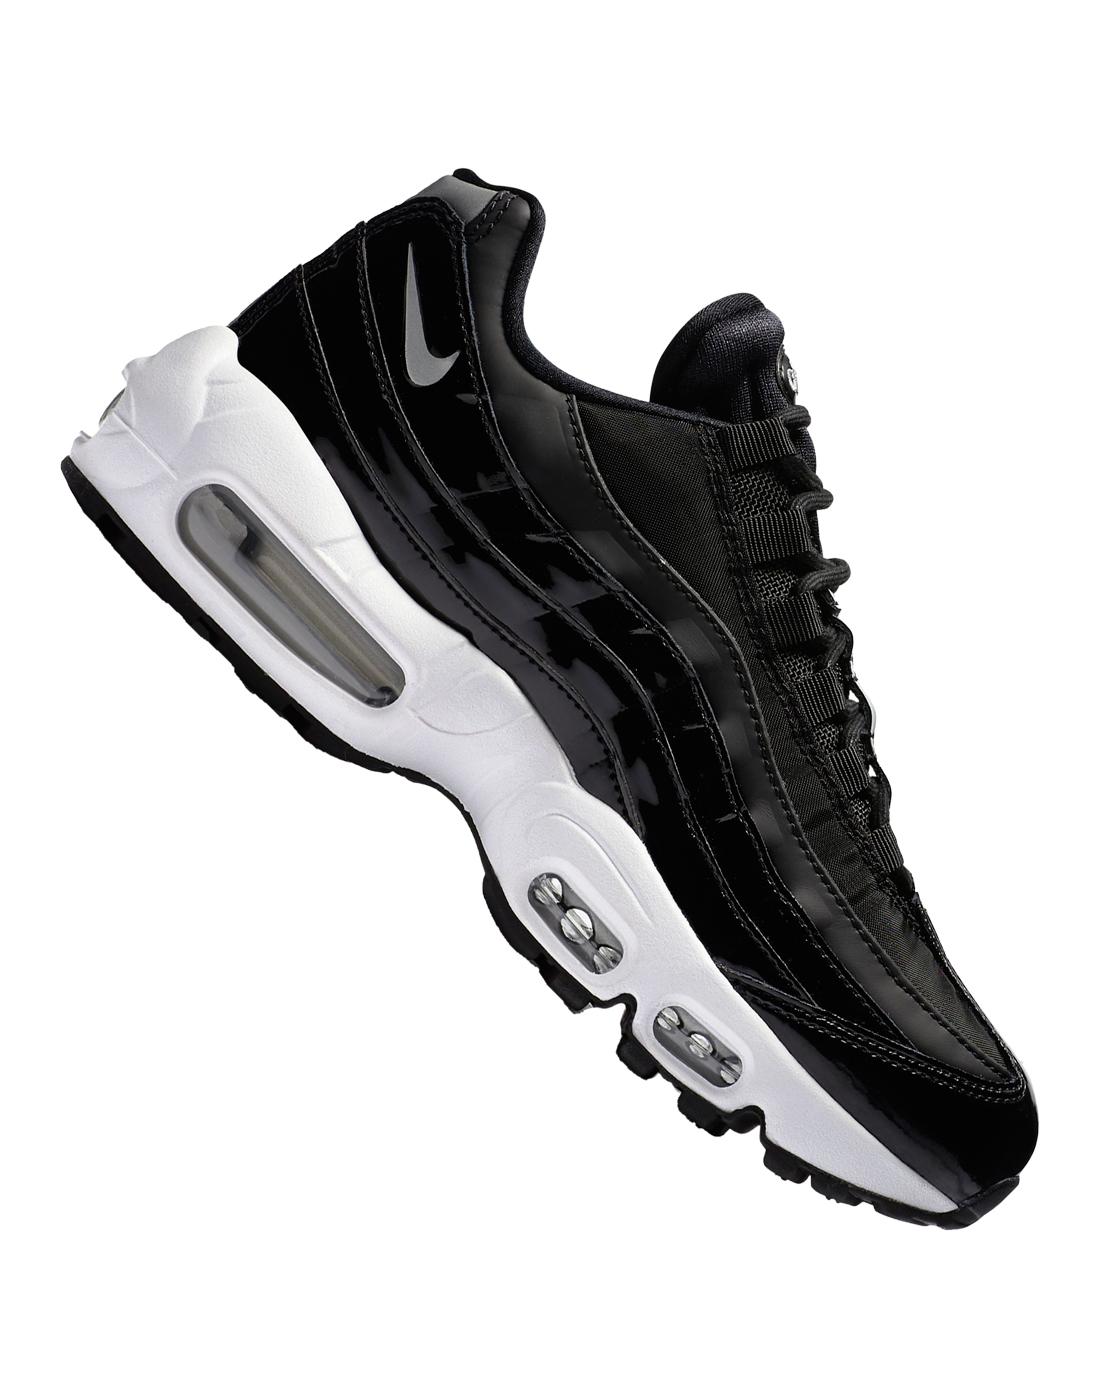 88d0f93713 Nike Womens Air Max 95 SE Prm | Life Style Sports